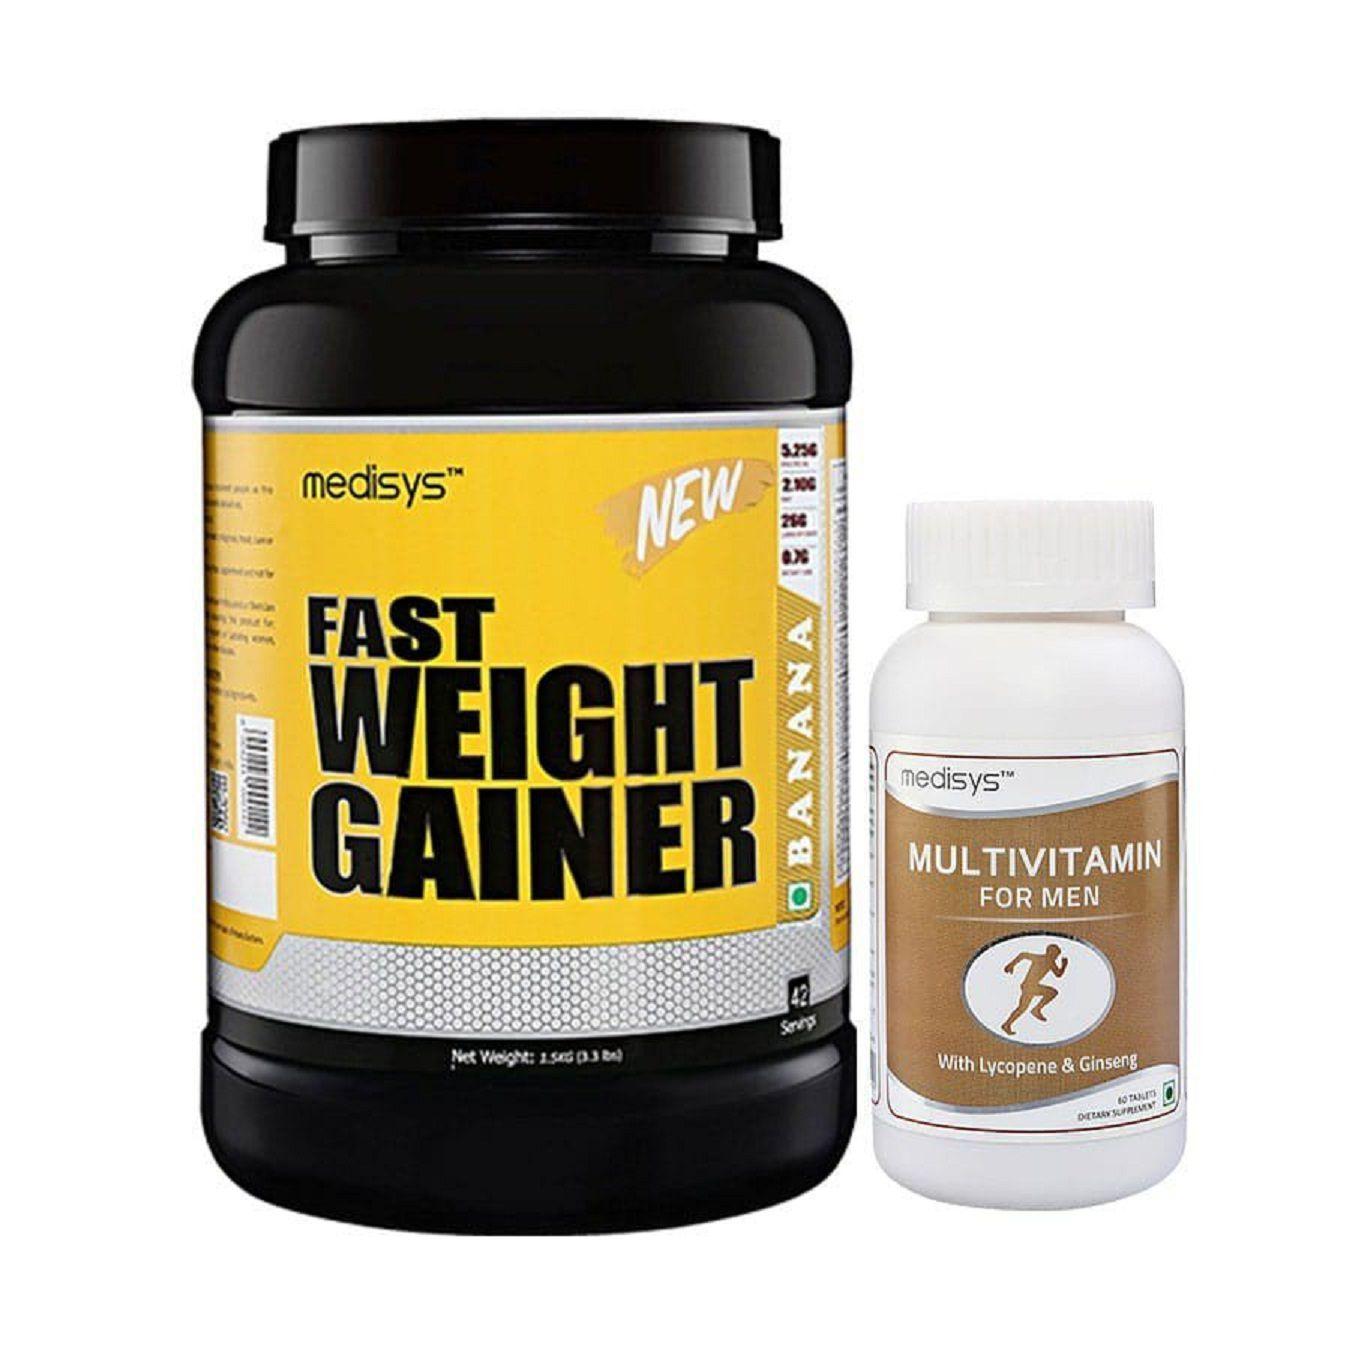 MEDISYS Fast Weight Gainer-Banana -Free Multivitamin 1.5 kg Weight Gainer Powder